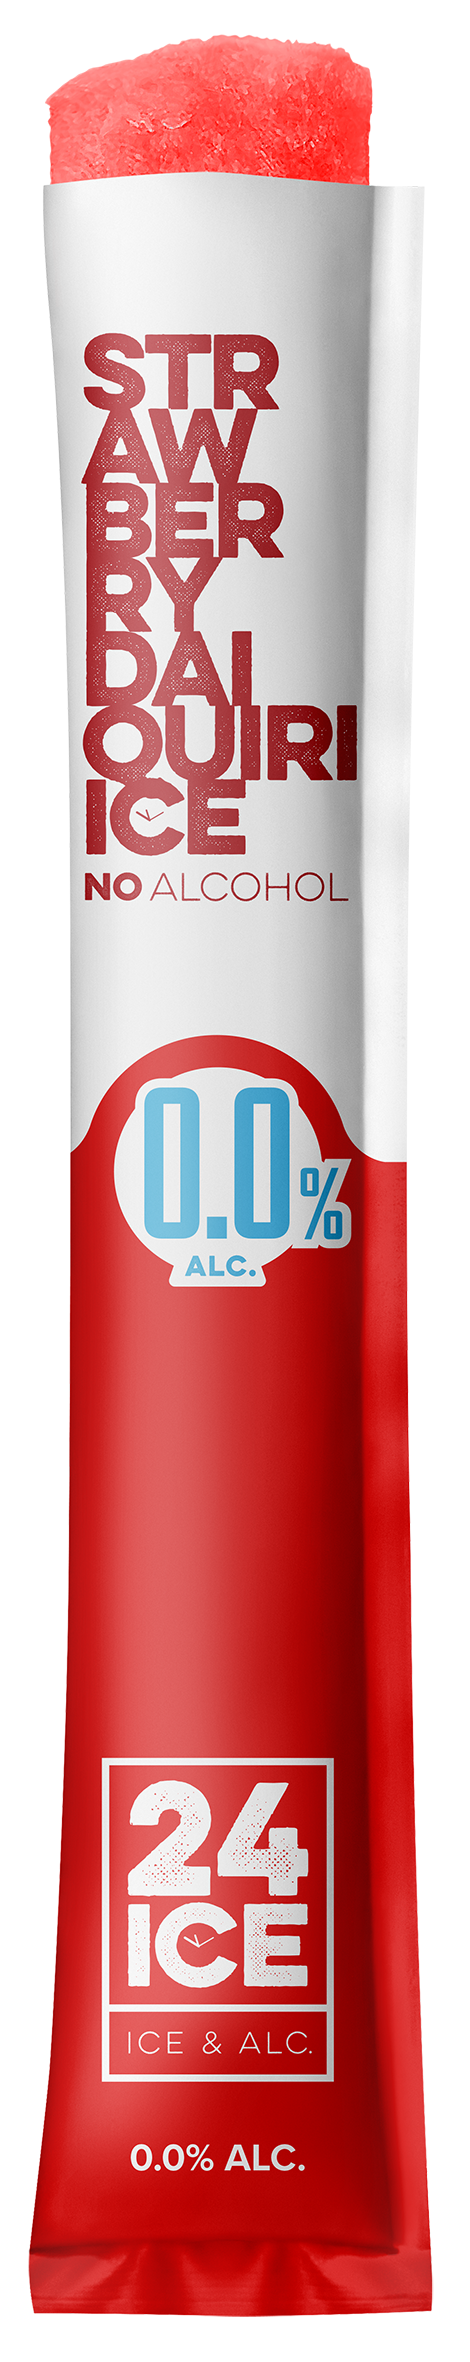 Strawberry Daiquiri ICE 0.0%